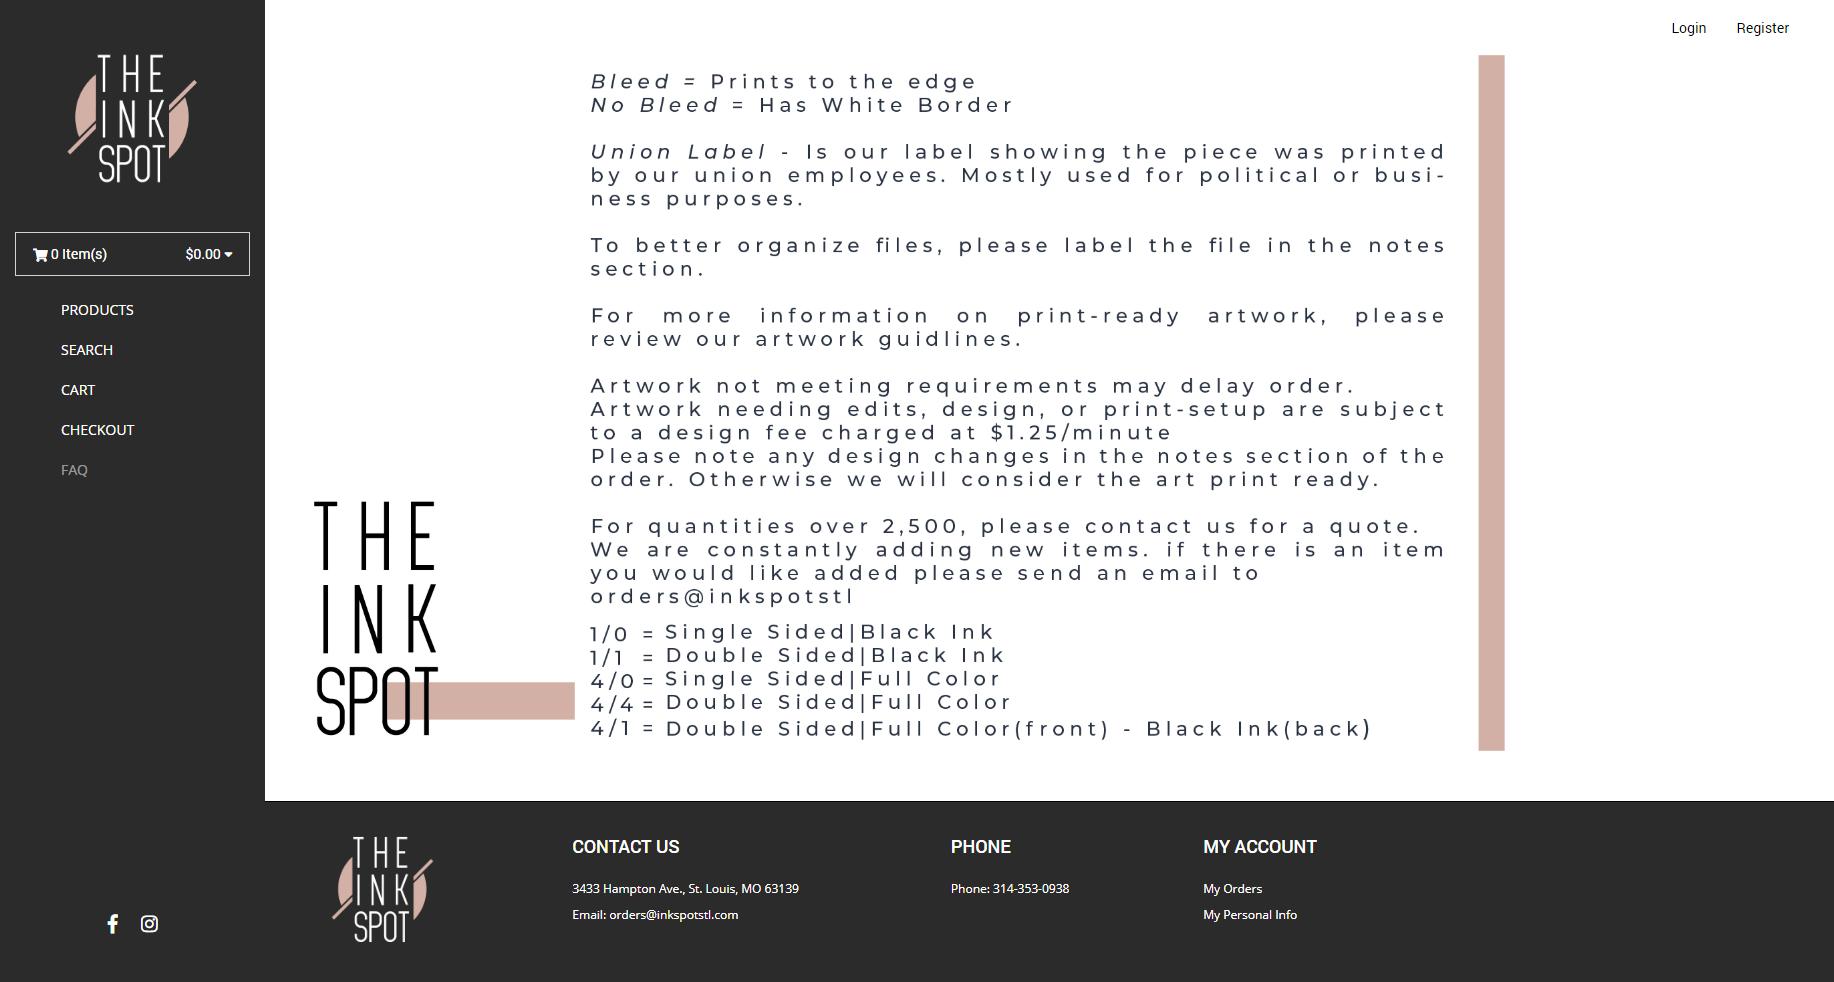 screencapture-inkspotstl-orderprintnow-PortalPage-aspx-2019-07-04-11_57_40